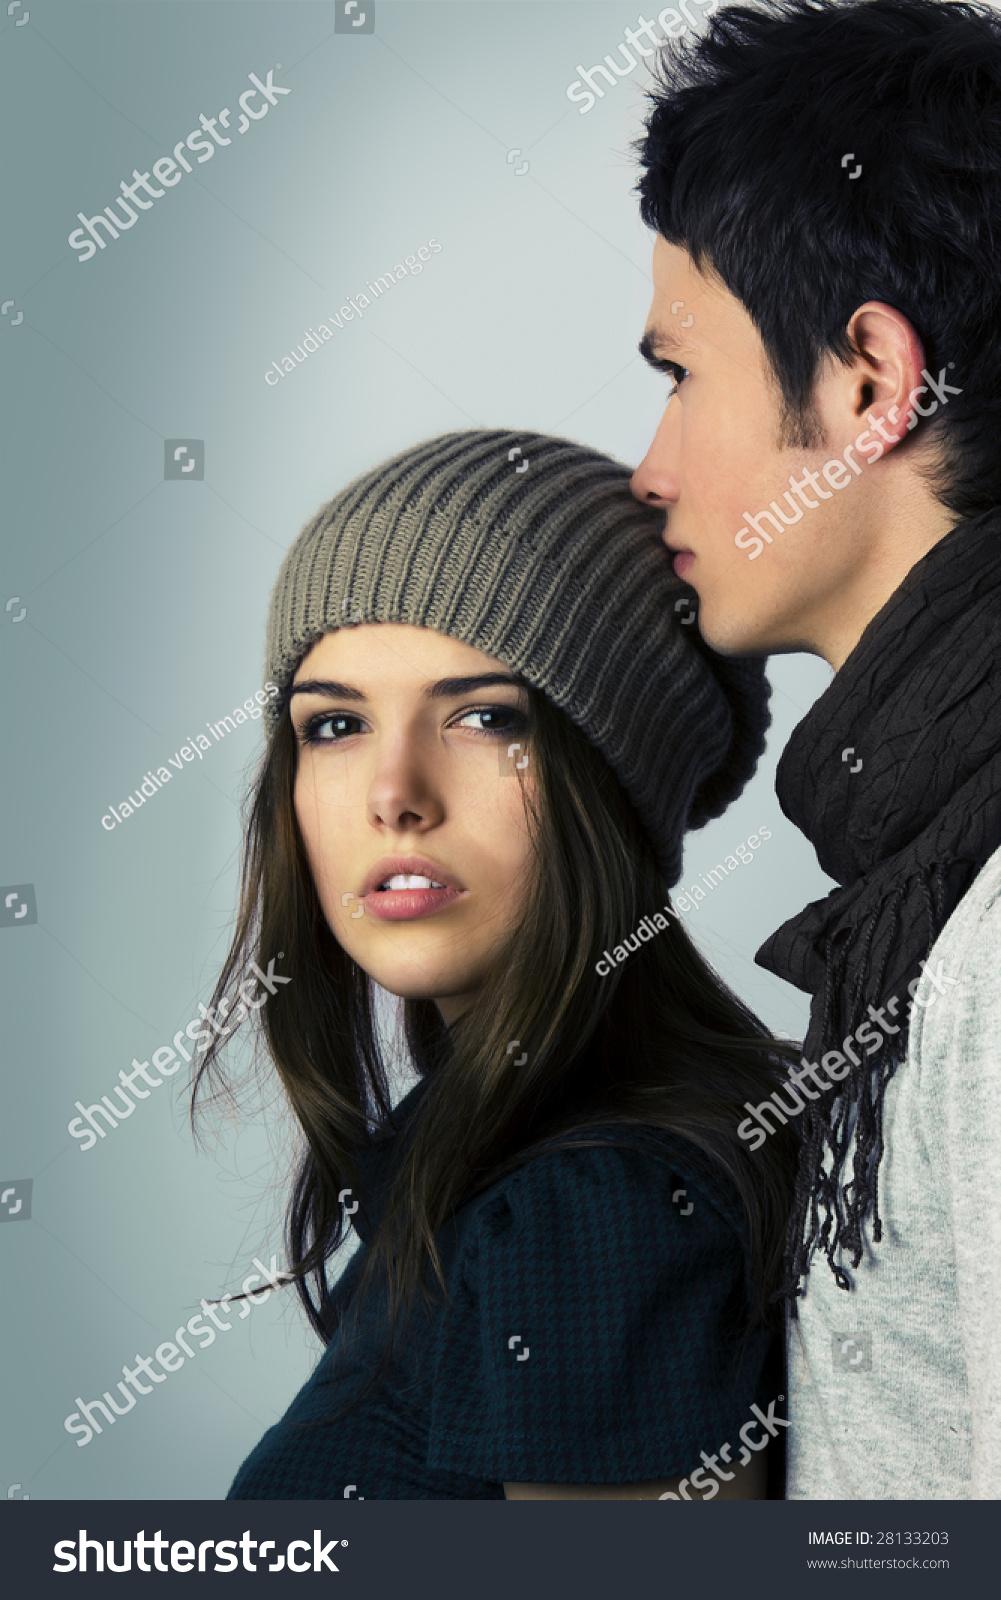 Best of Teen Models Kissing